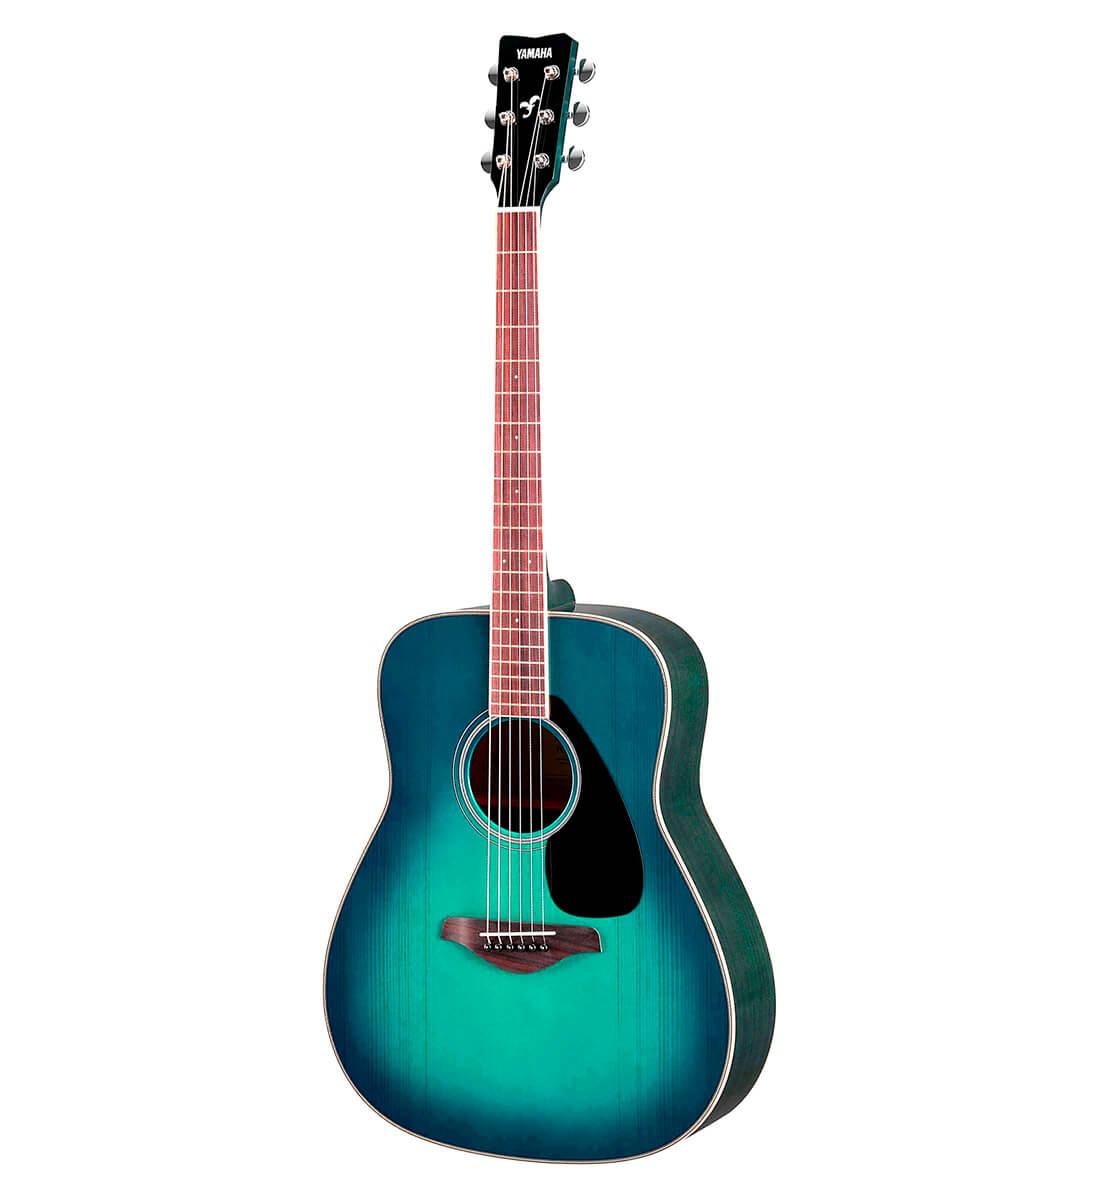 Yamaha FG820SB western-guitar sunsetblue